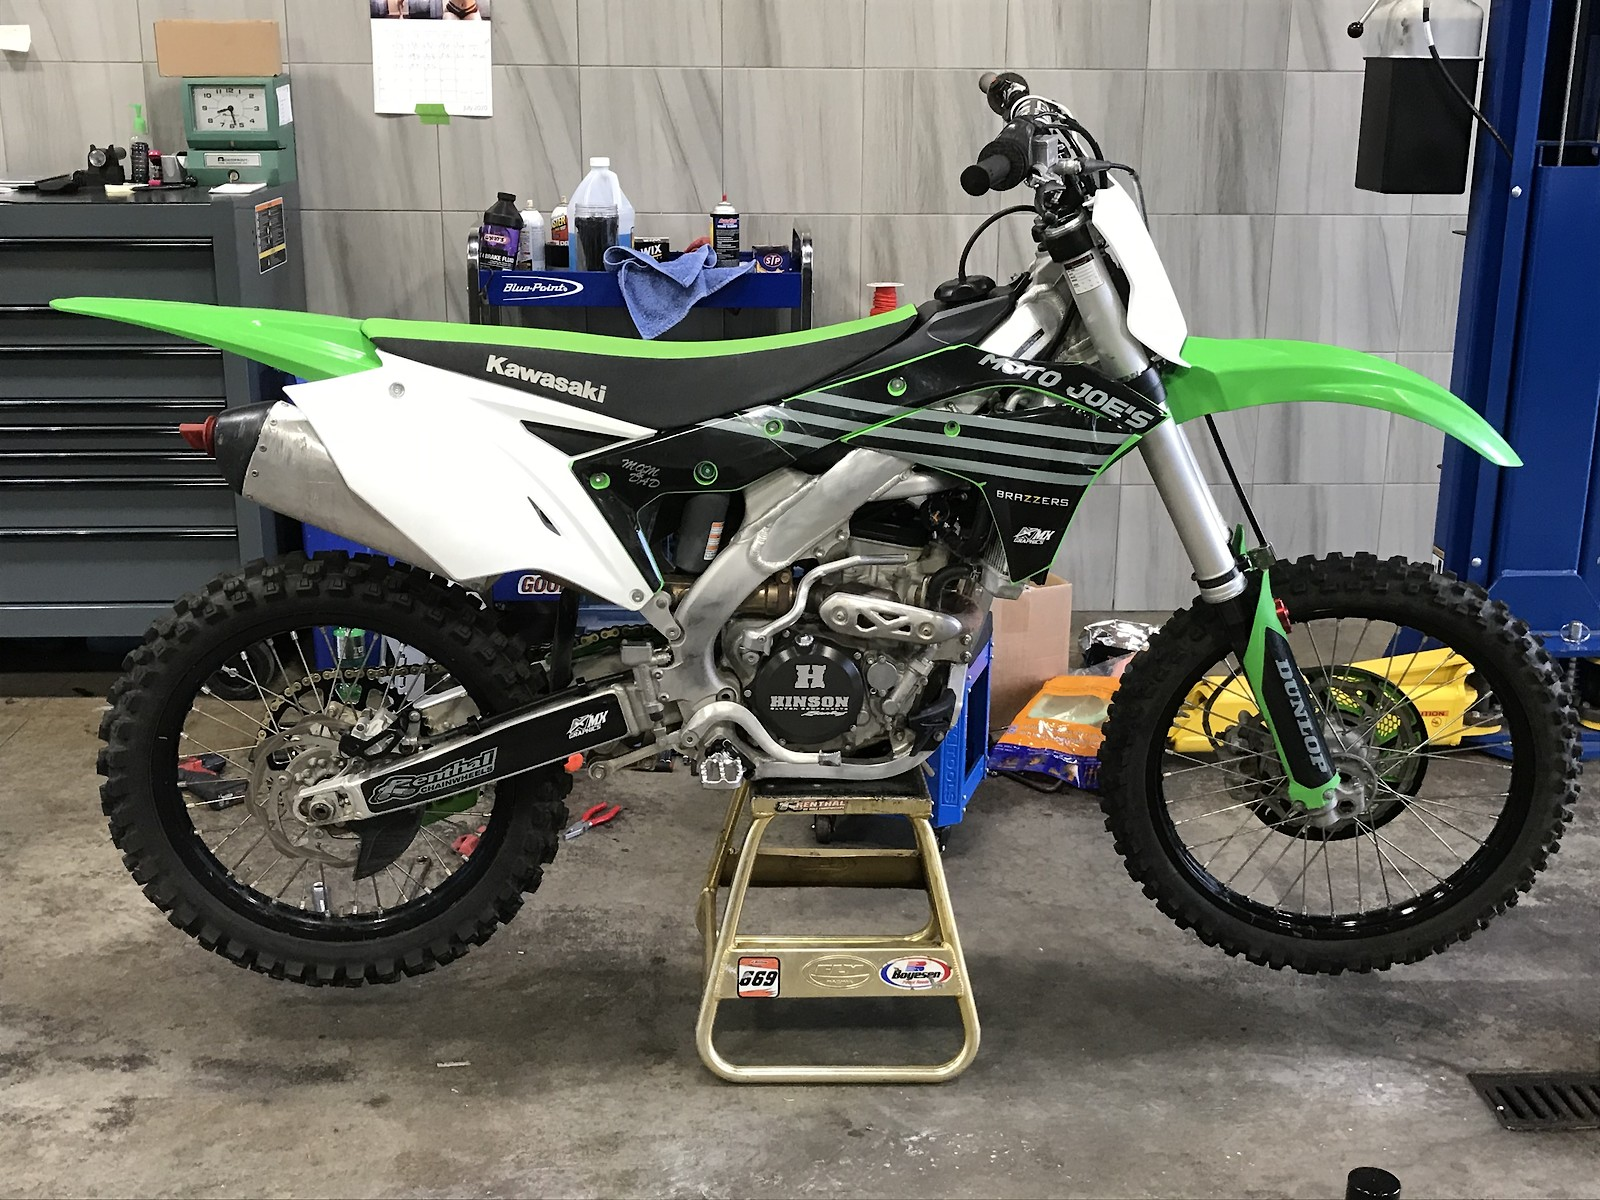 minimoto19's Kawasaki